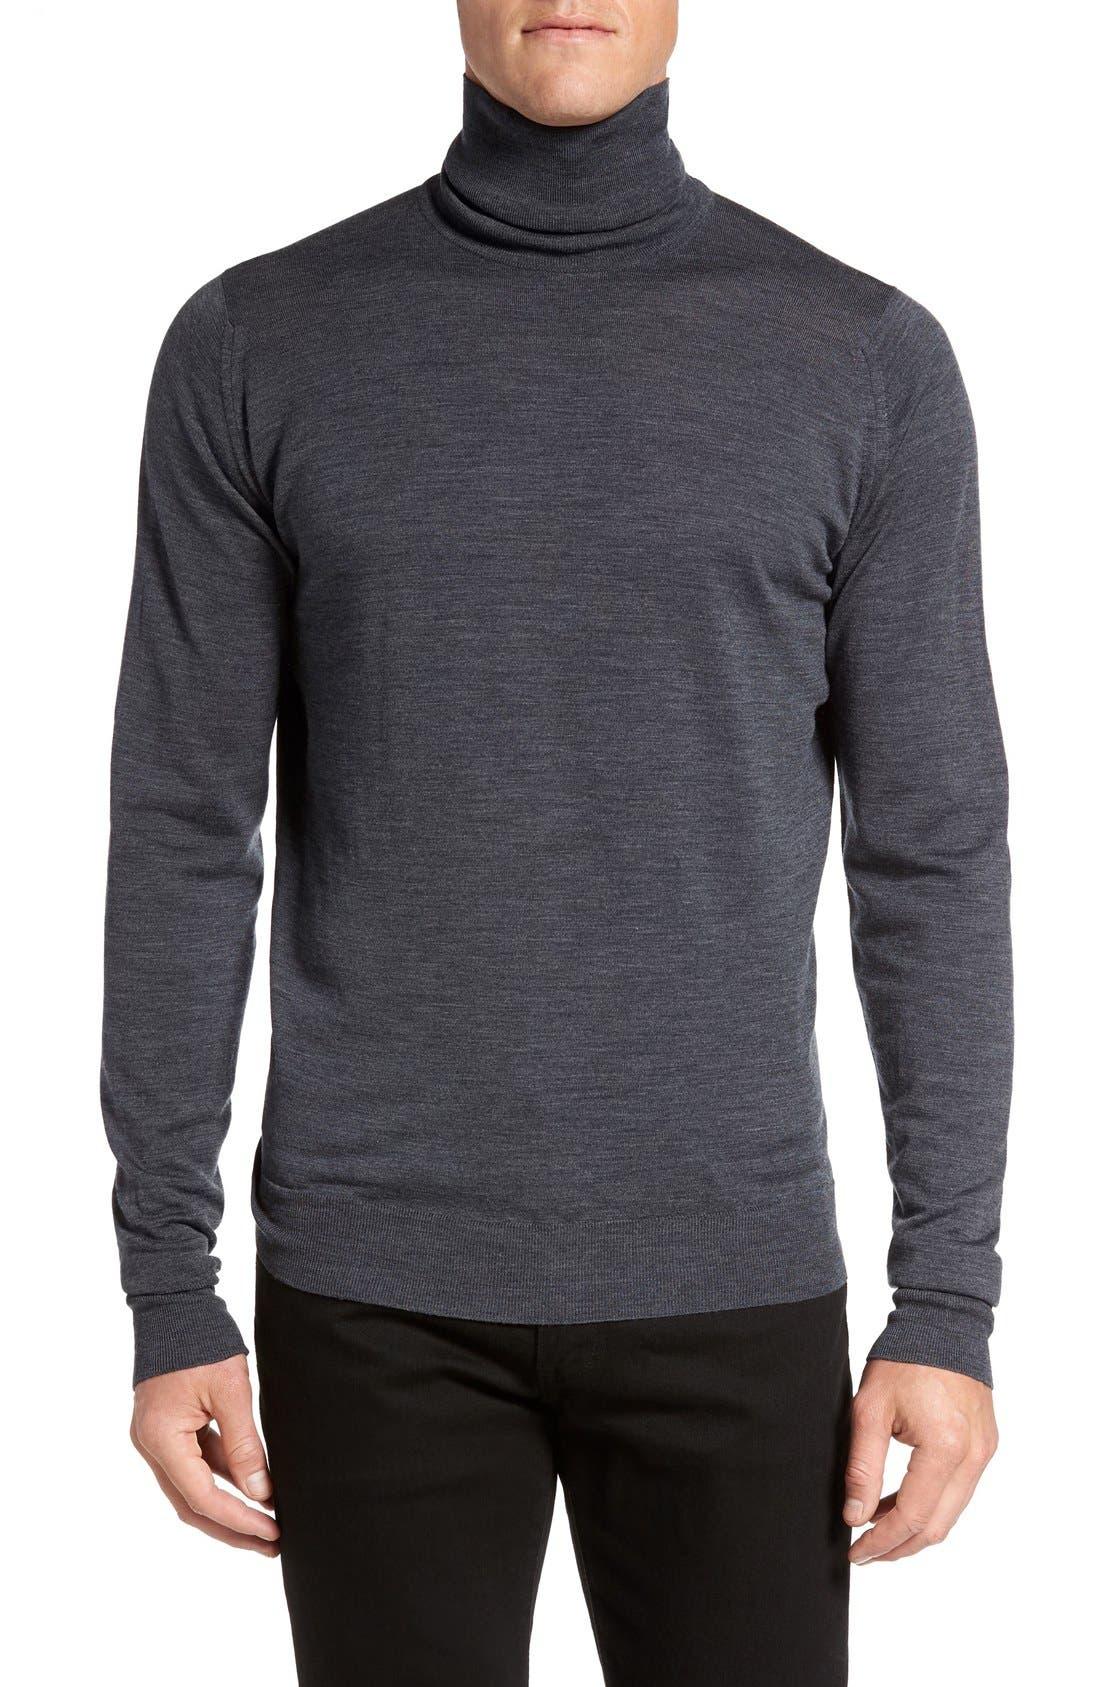 Main Image - John Smedley 'Richards' Easy Fit Turtleneck Wool Sweater